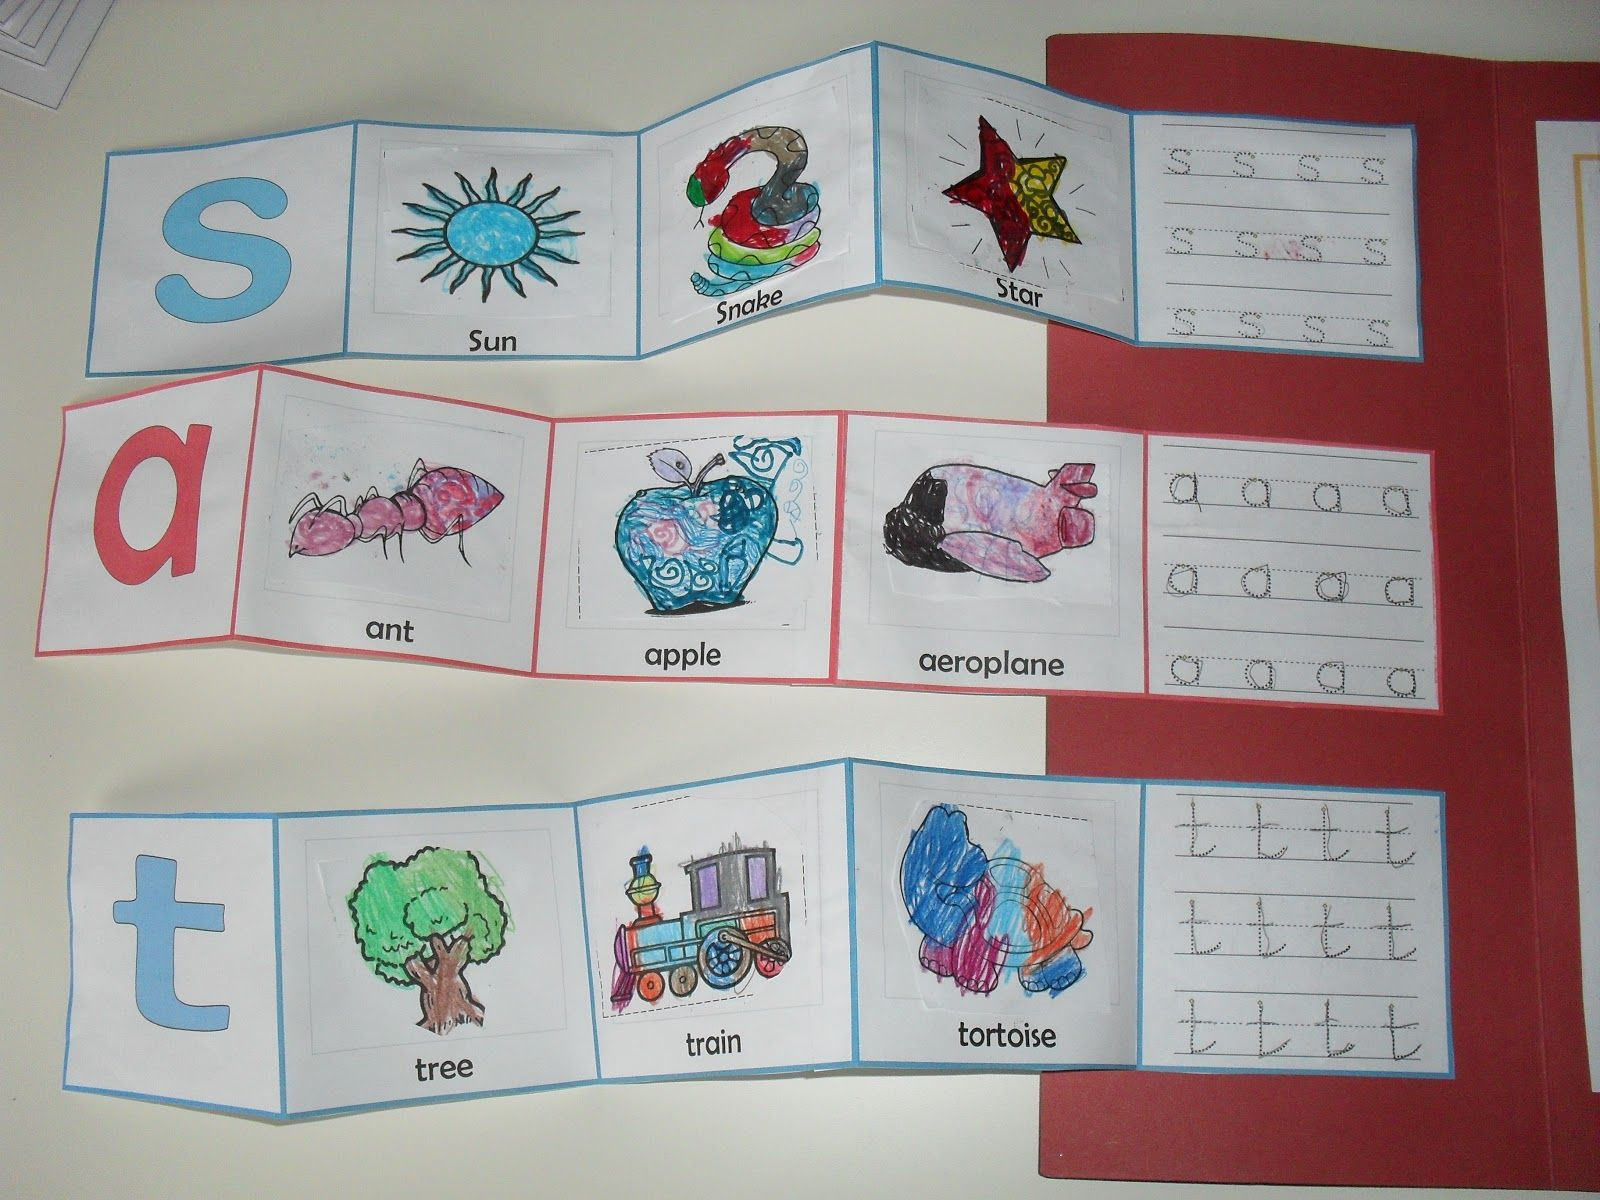 jolly phonics worksheets printables - Google Search | phonics ...